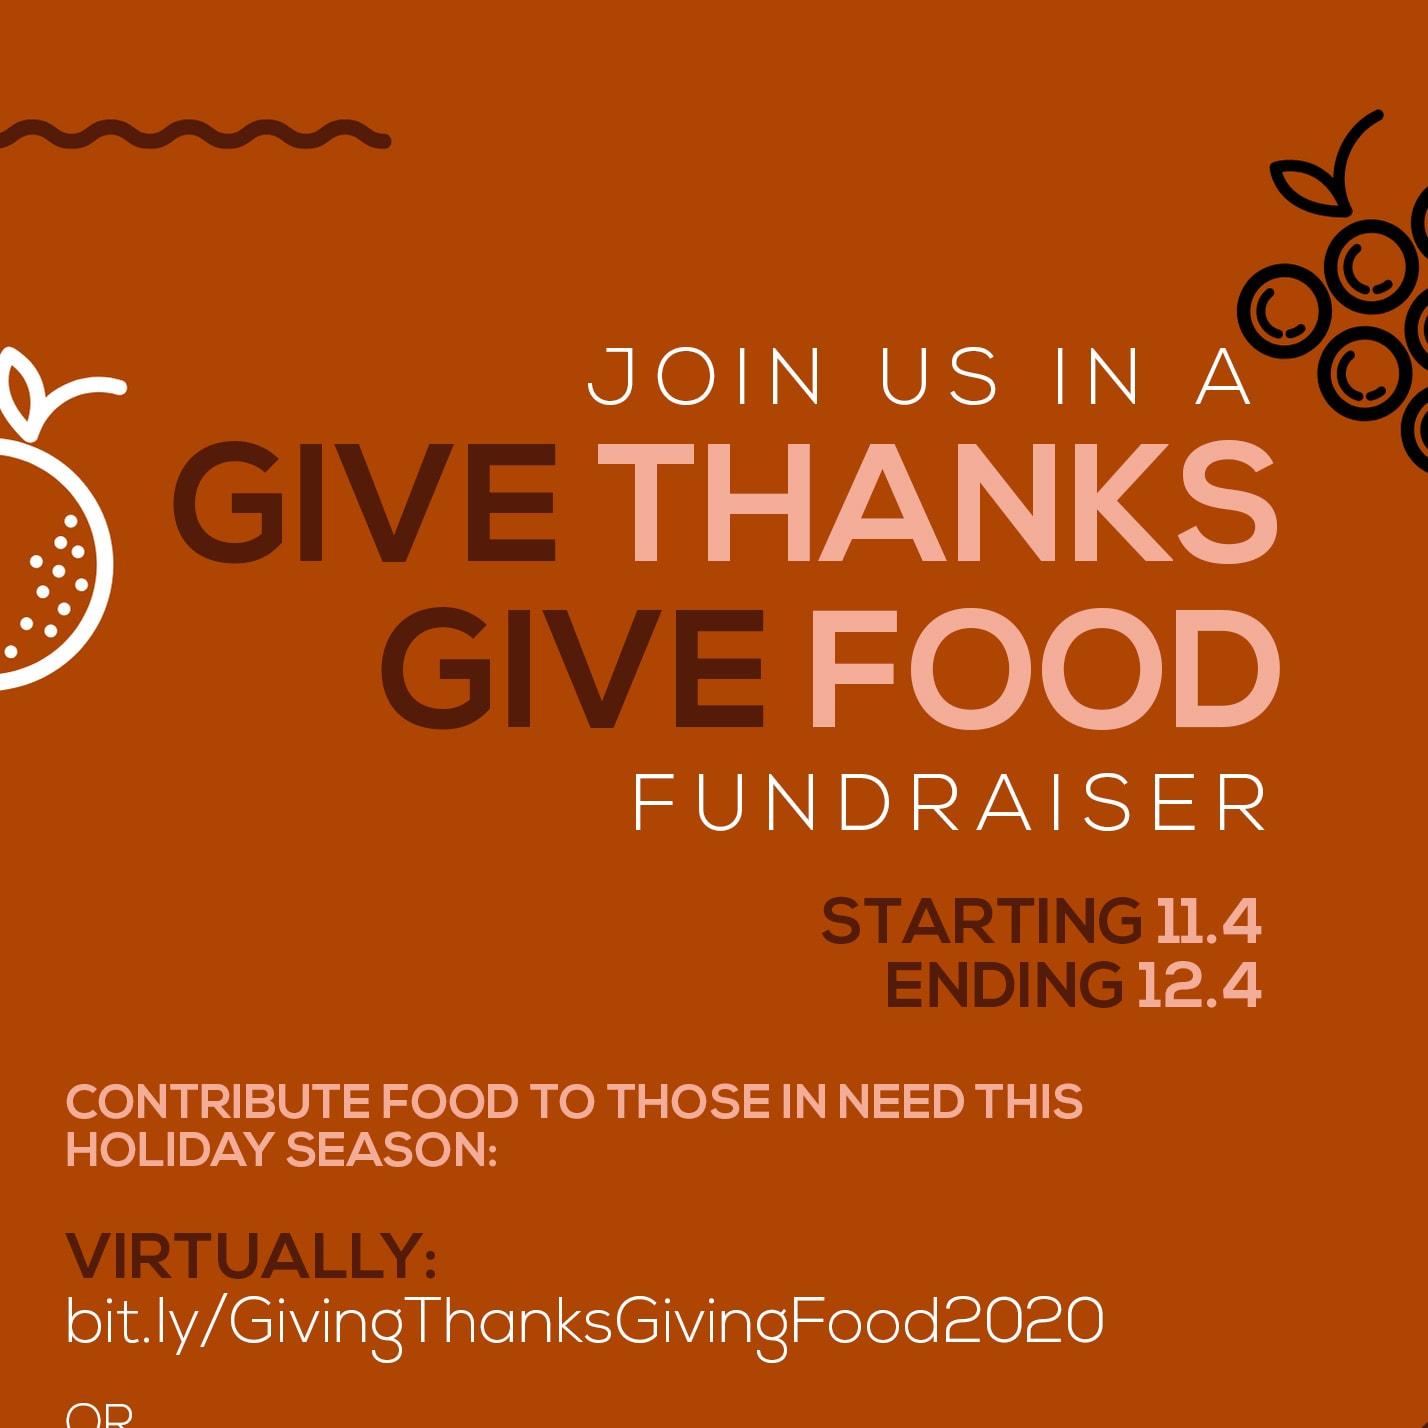 GiveThanks_GiveFood FlyerUpdated